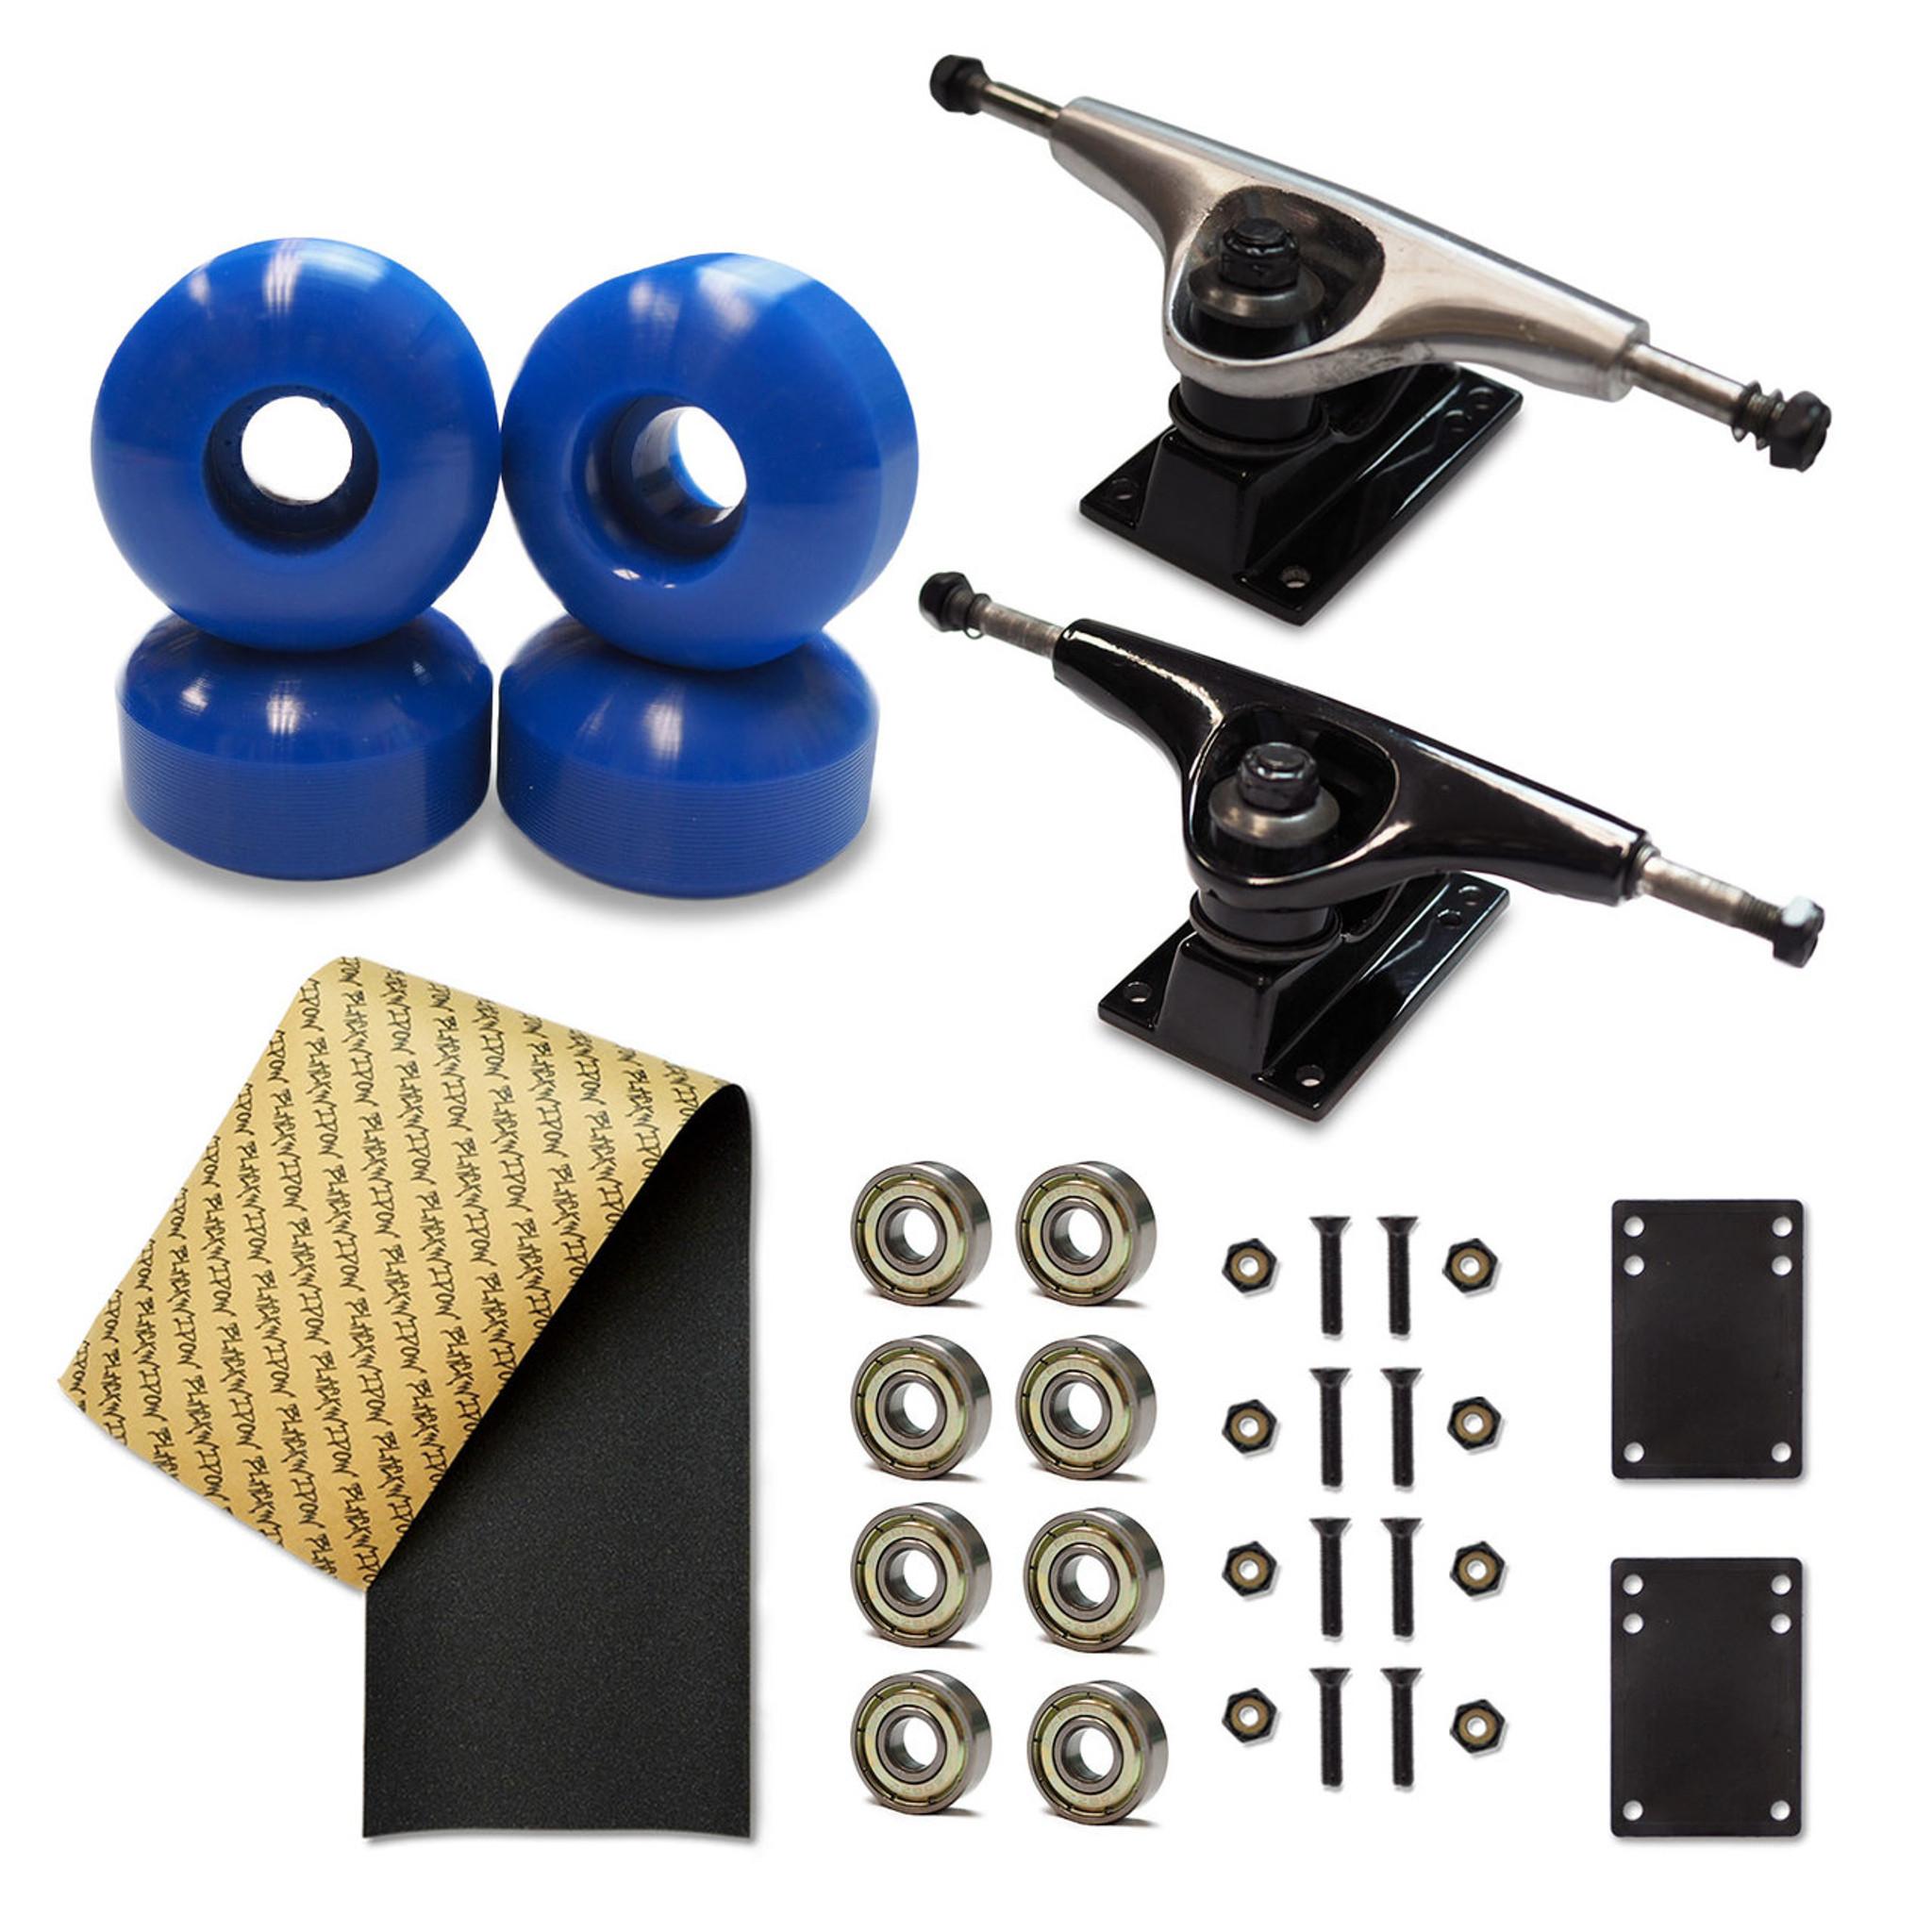 Owlsome 5.0 Black Aluminum Skateboard Trucks w// 52mm Wheels Combo Set